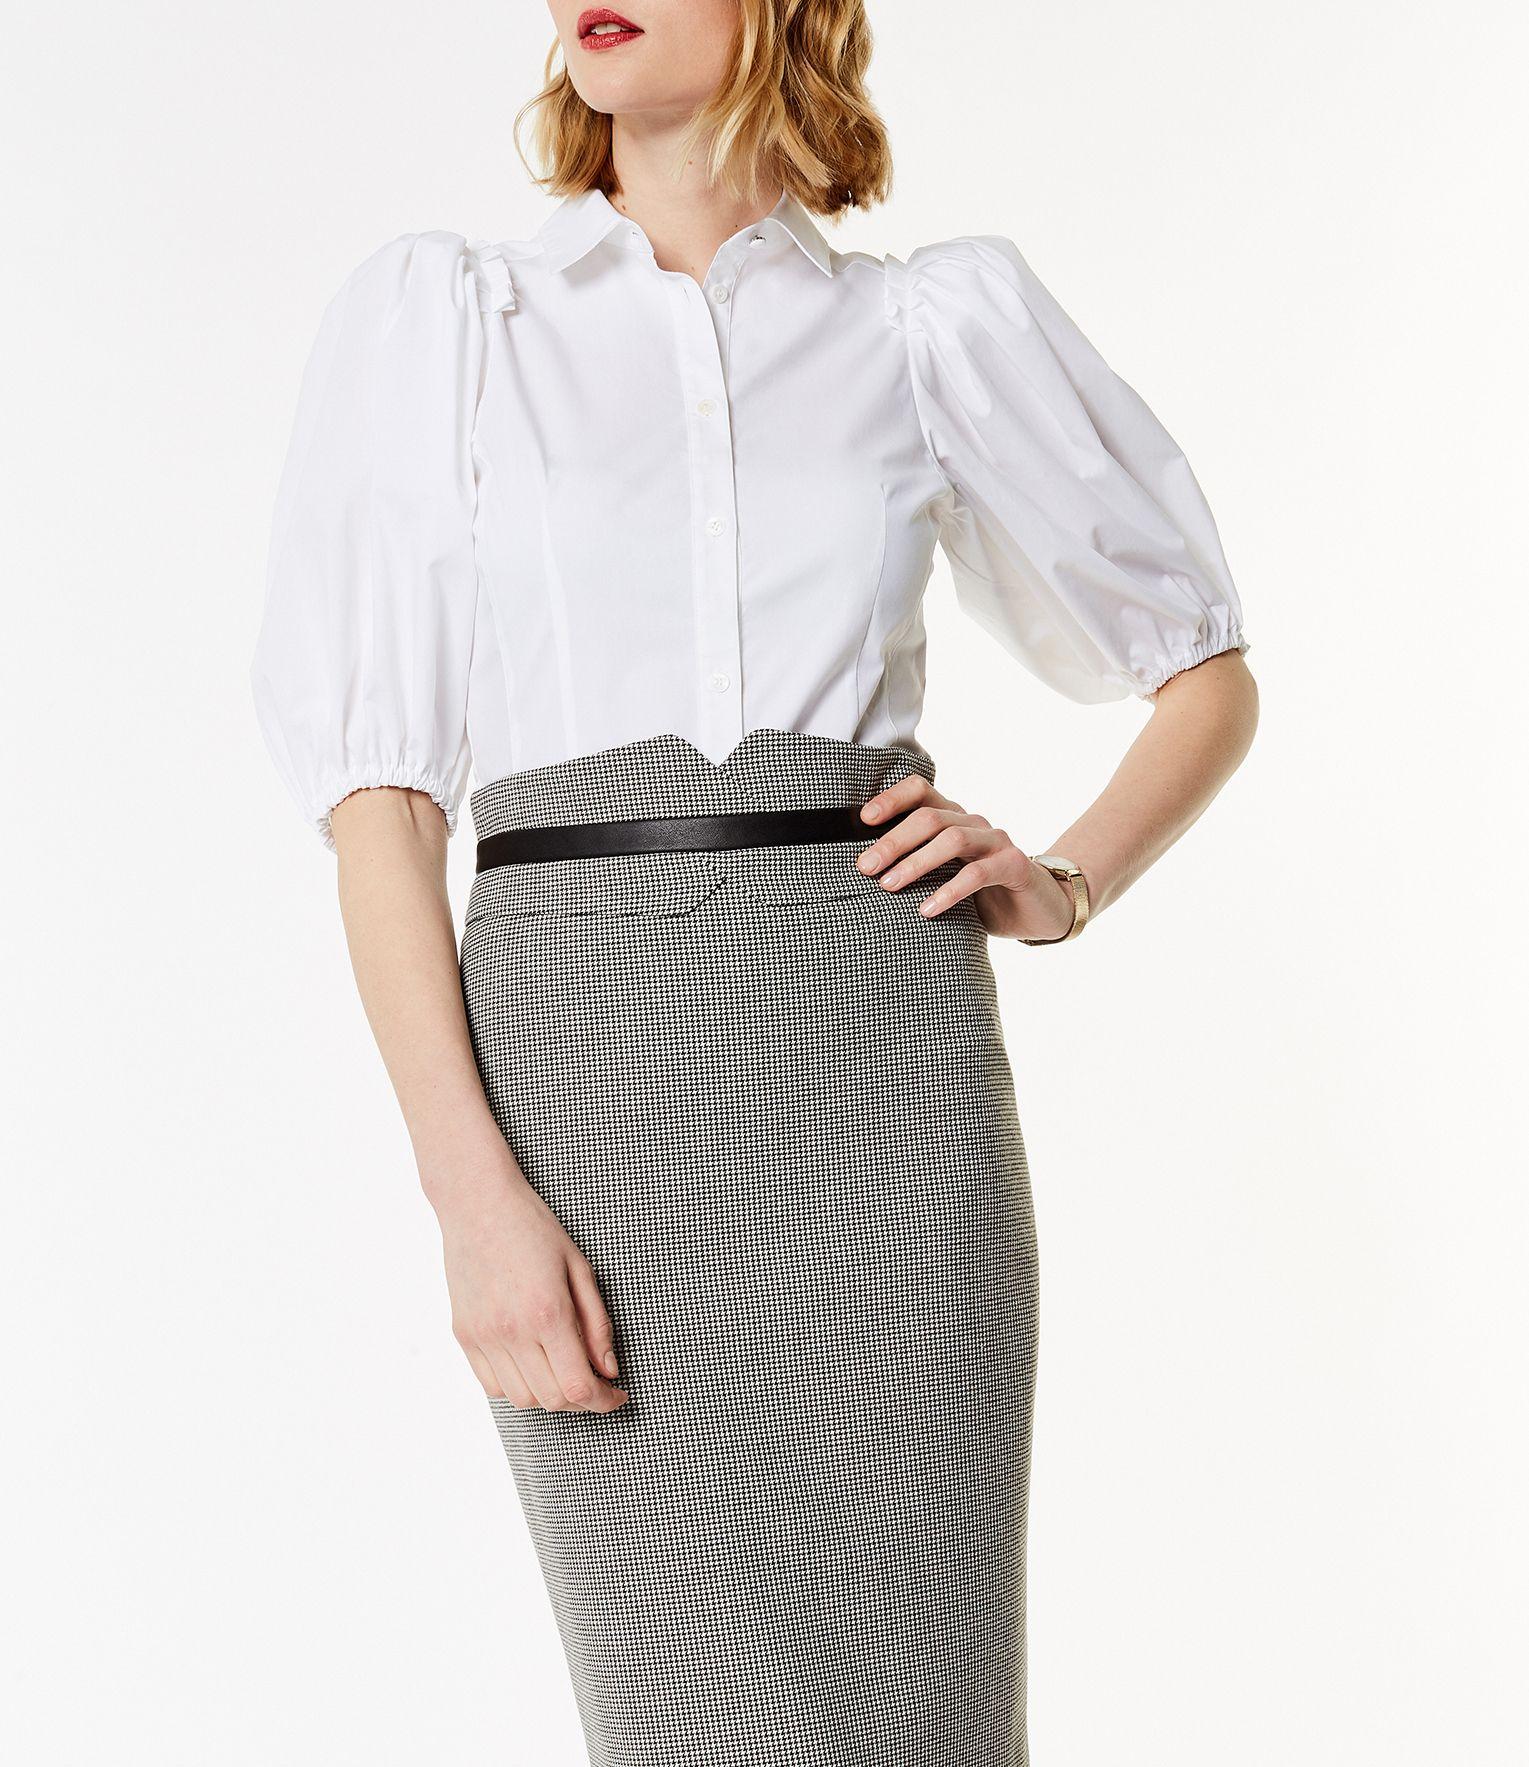 fc132ffdbb5 Karen Millen, Balloon Sleeve Shirt White | White shirts | Shirts ...